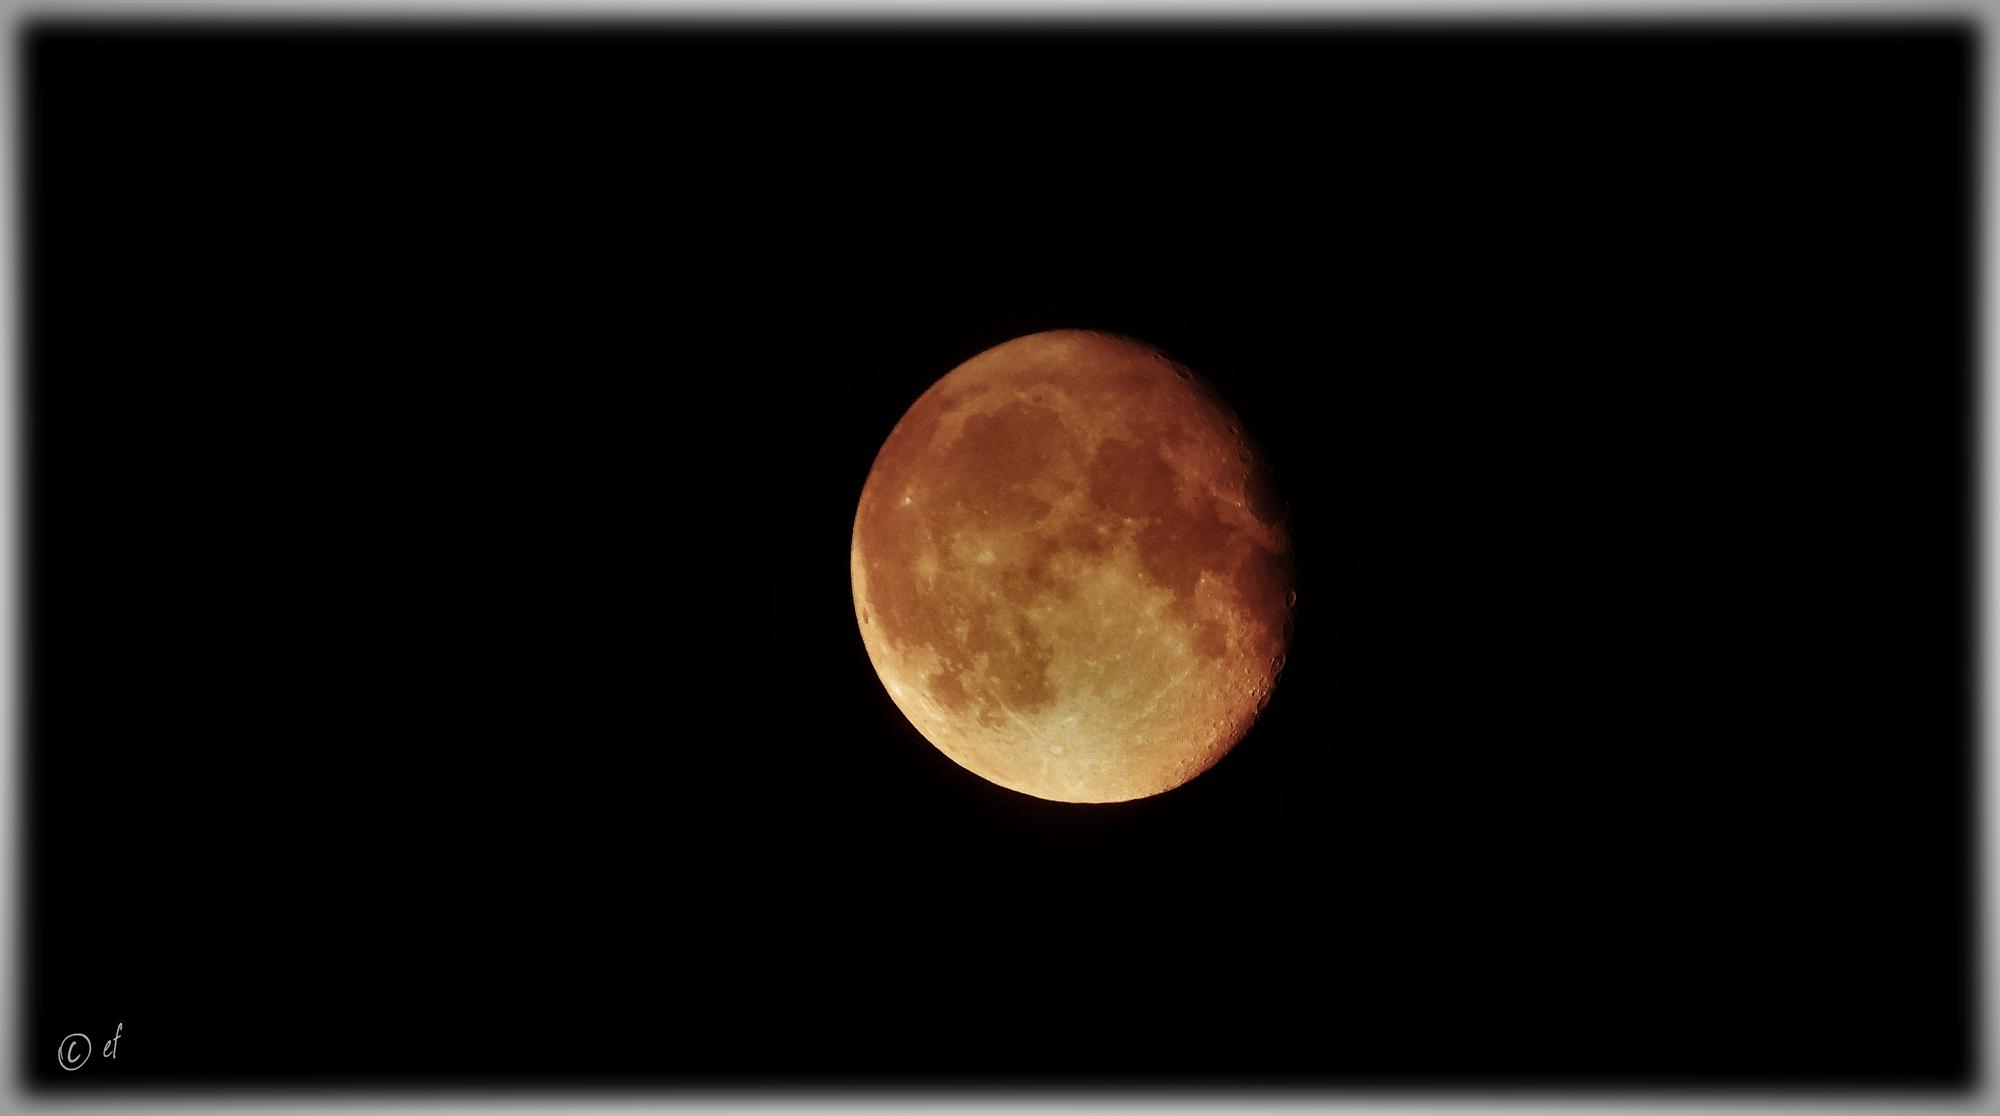 La luna - der Mond